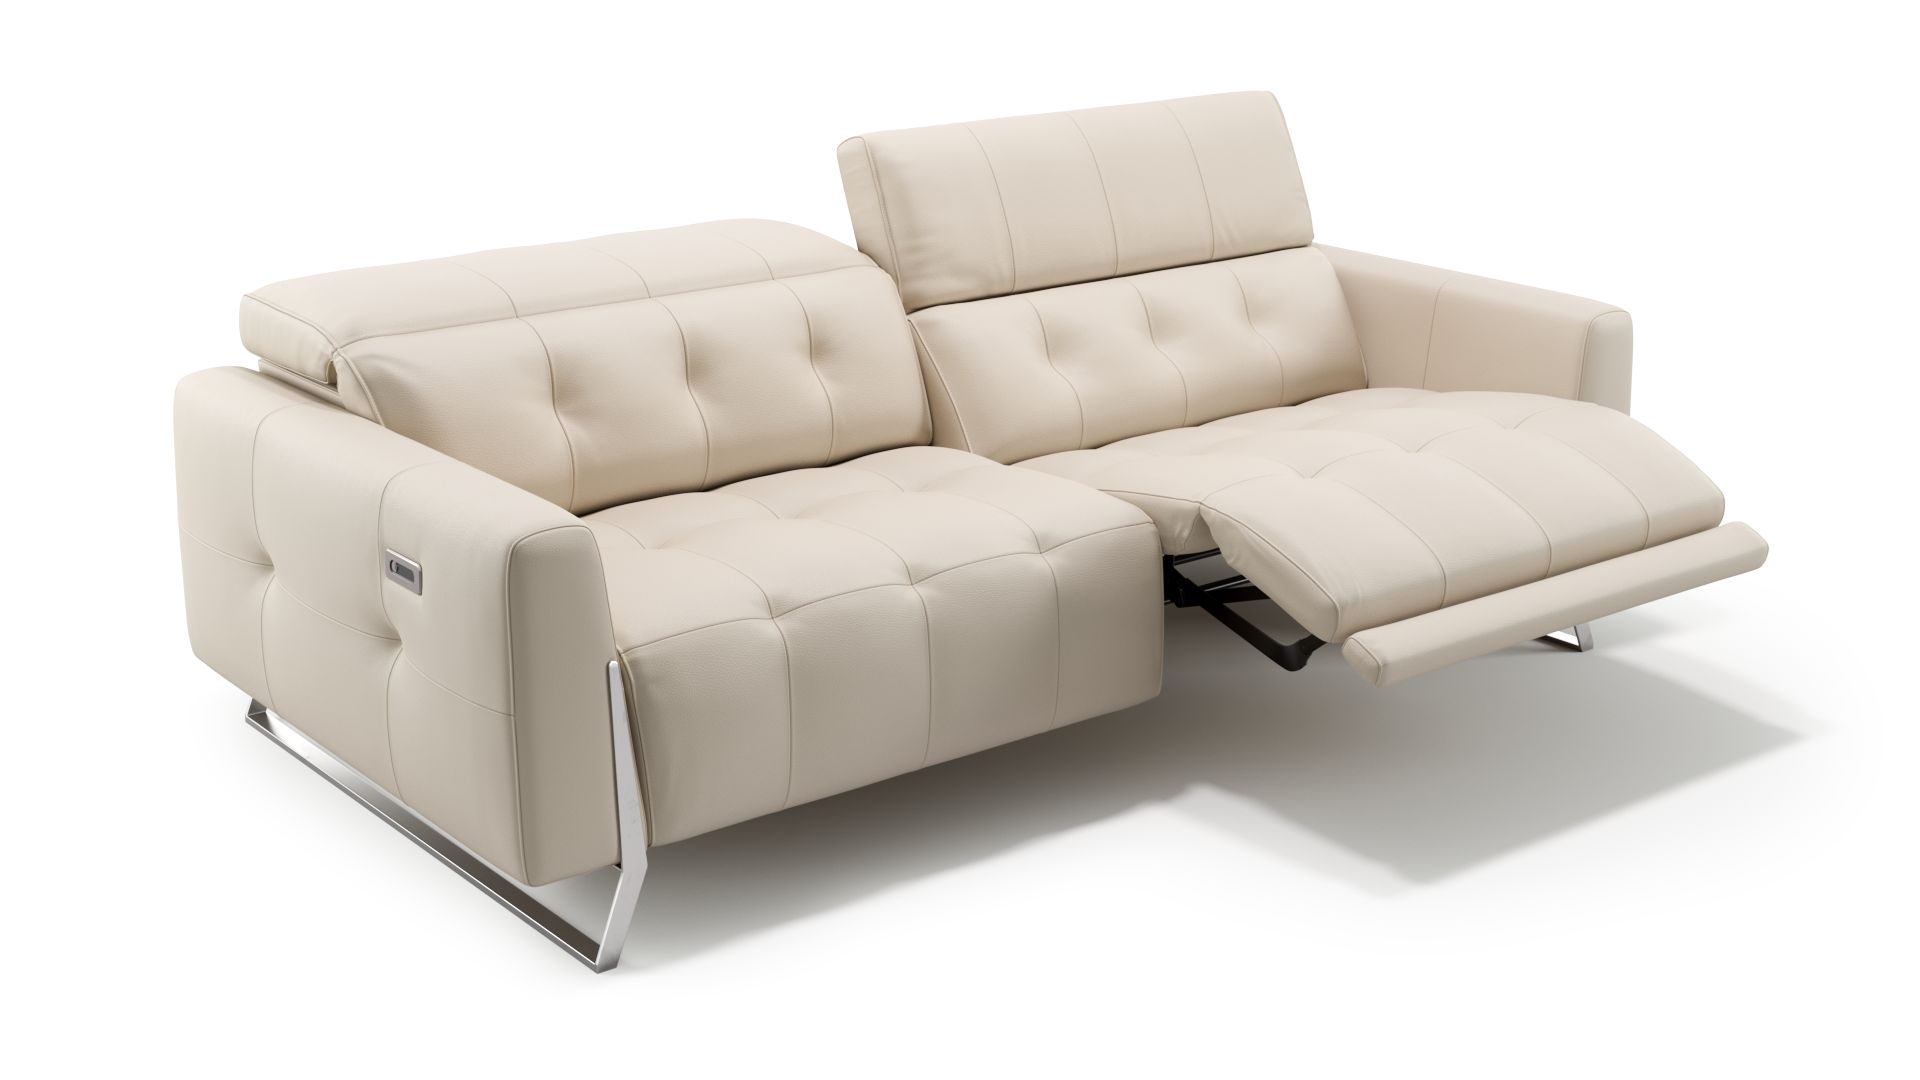 Leder 3-Sitzer Sofa CANEVA